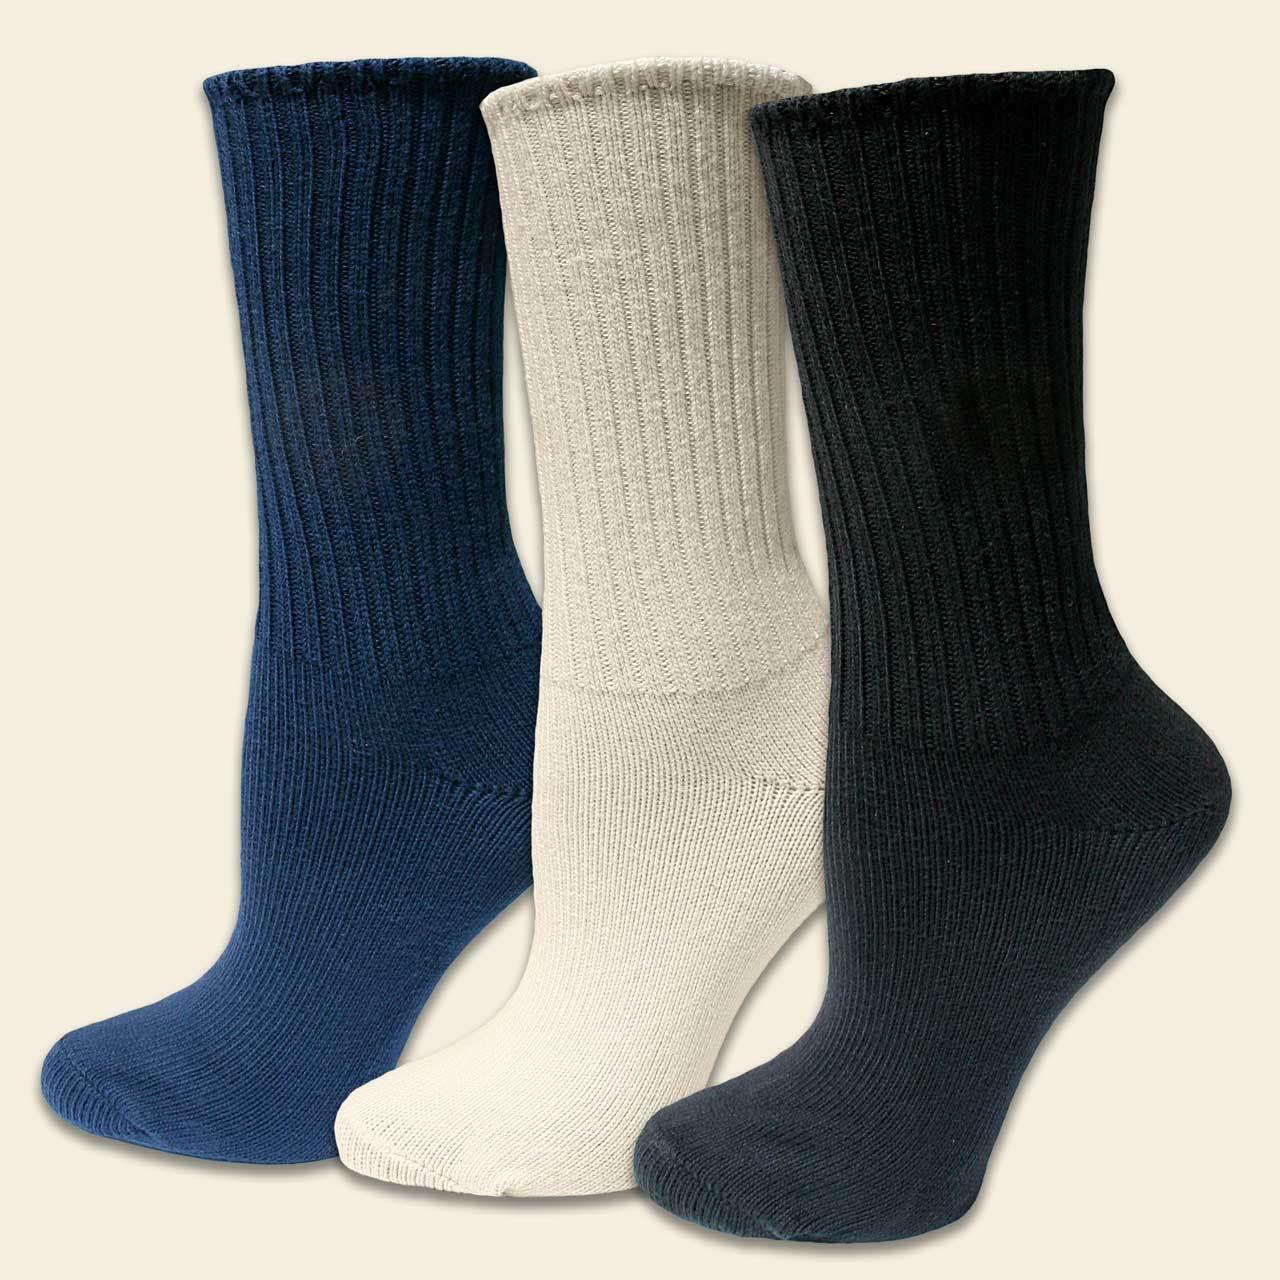 Maggie's Classic Crew Socks Tri-Color 3-Pack [2195triN] - $21 95